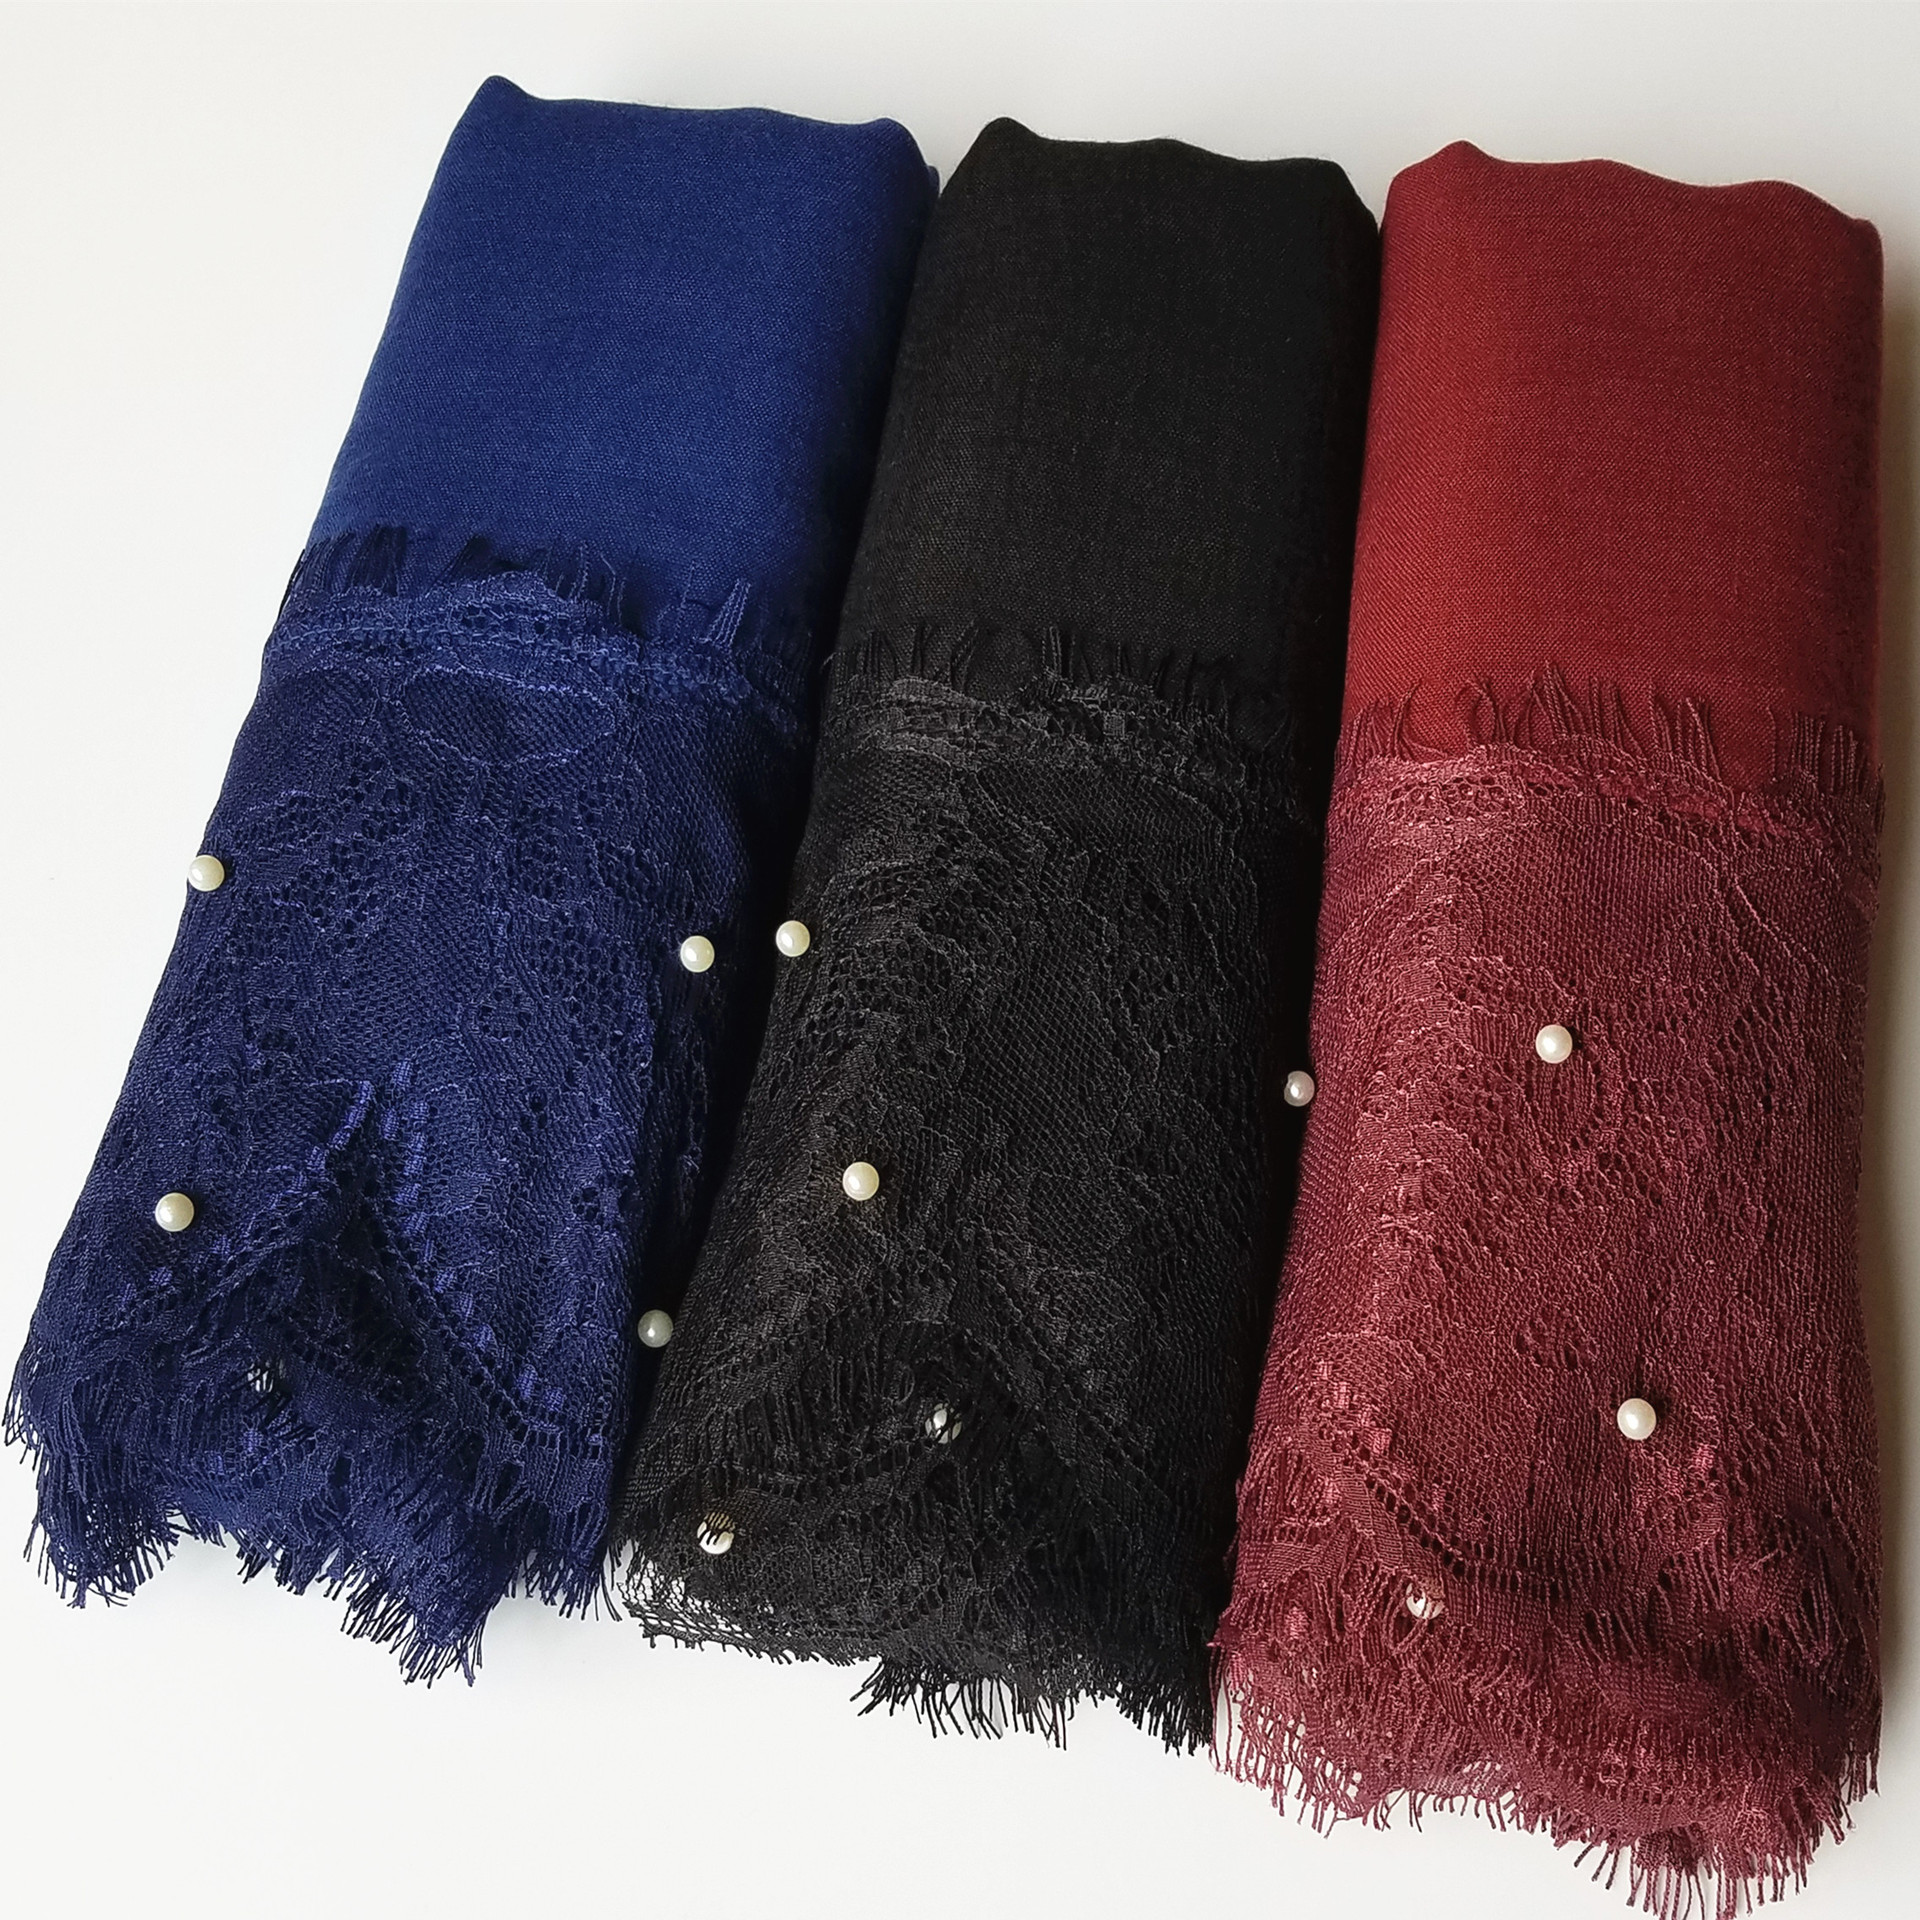 2019 Women Plain Lace Scarf  Hijab Ladies Shawls Head Wrap Turban Islamic Cotton Headscarf Pearls Beading Hijab Femme Musulman